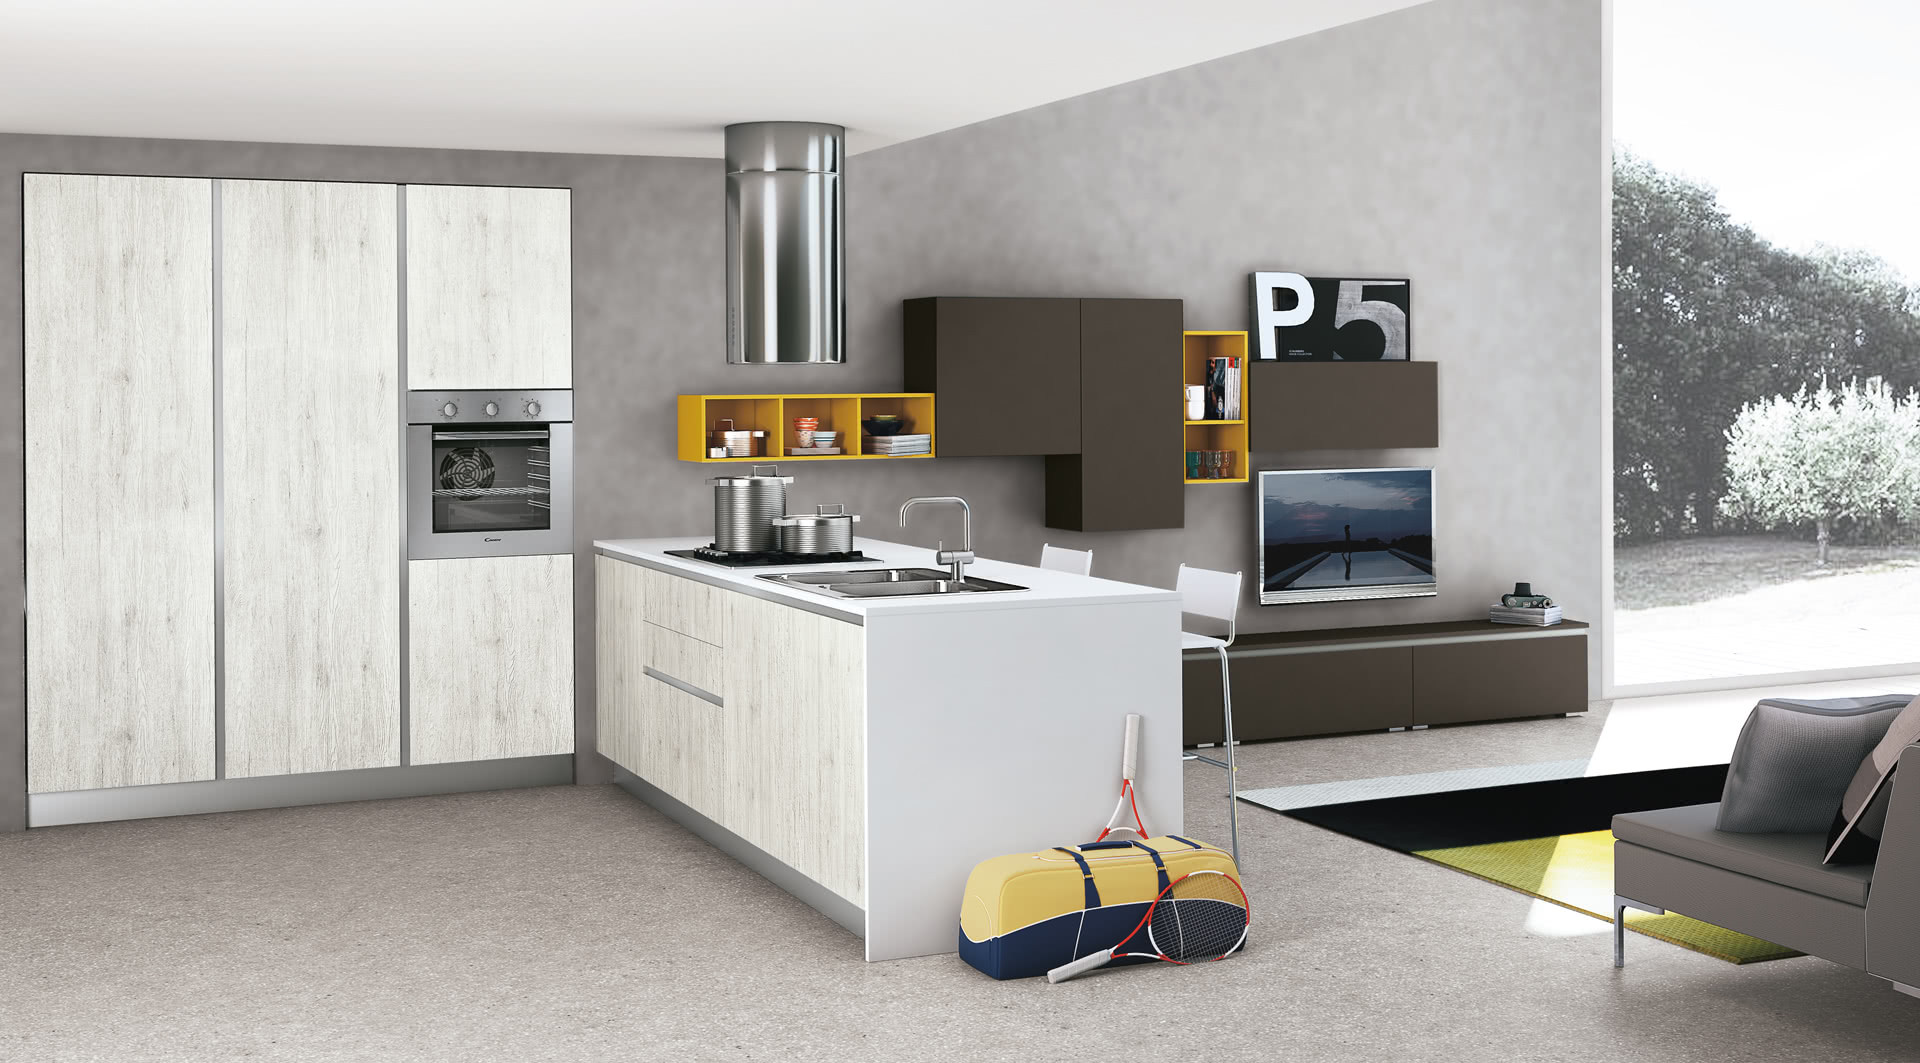 Cucine Creo Lube Opinioni cucina moderna ank - ank creo kitchens